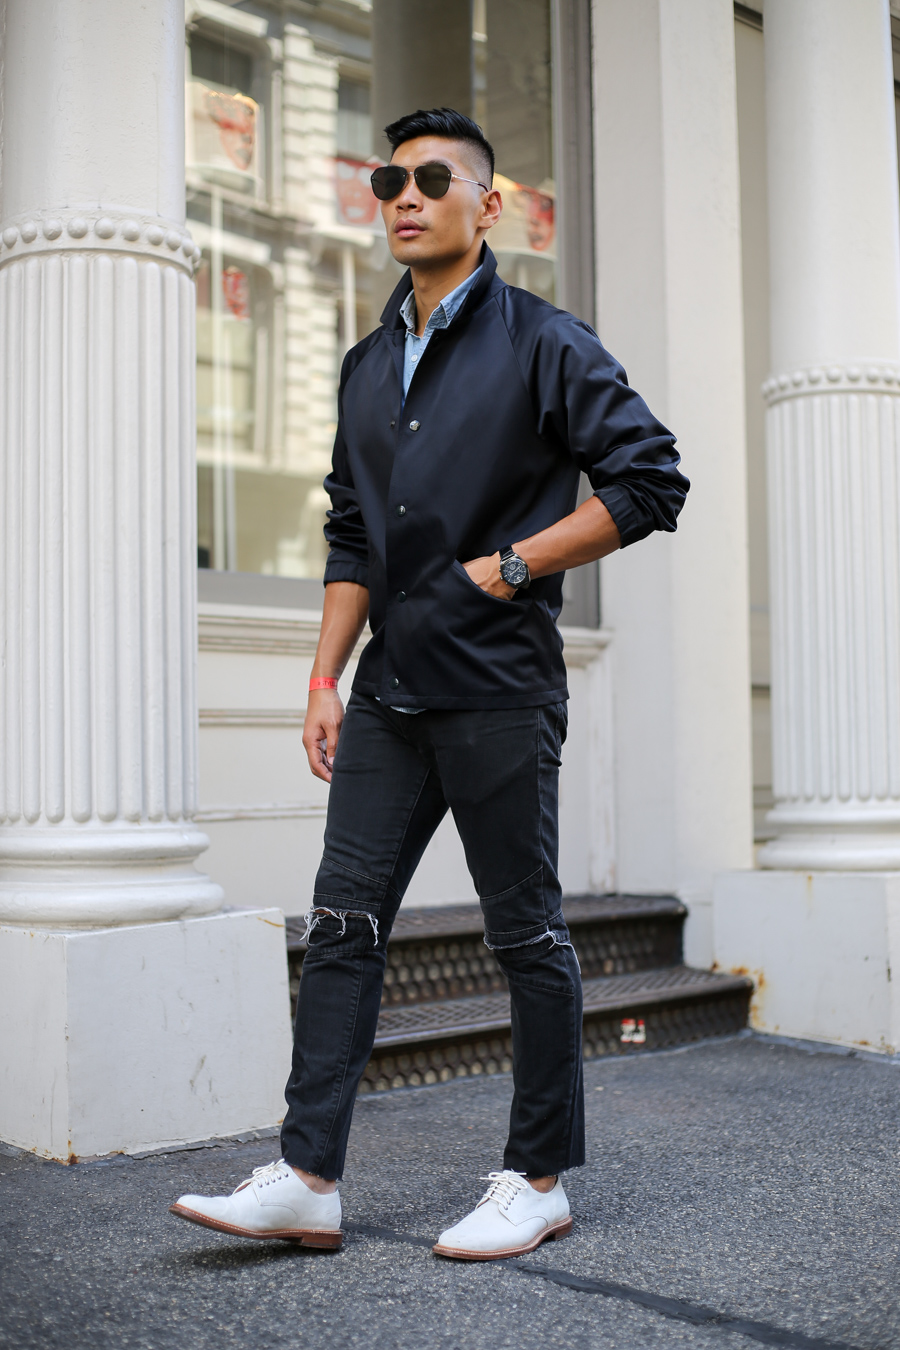 NYFWM, Marc Jacobs, menswear, Levitate Style, Leo Chan, Alicia Mara